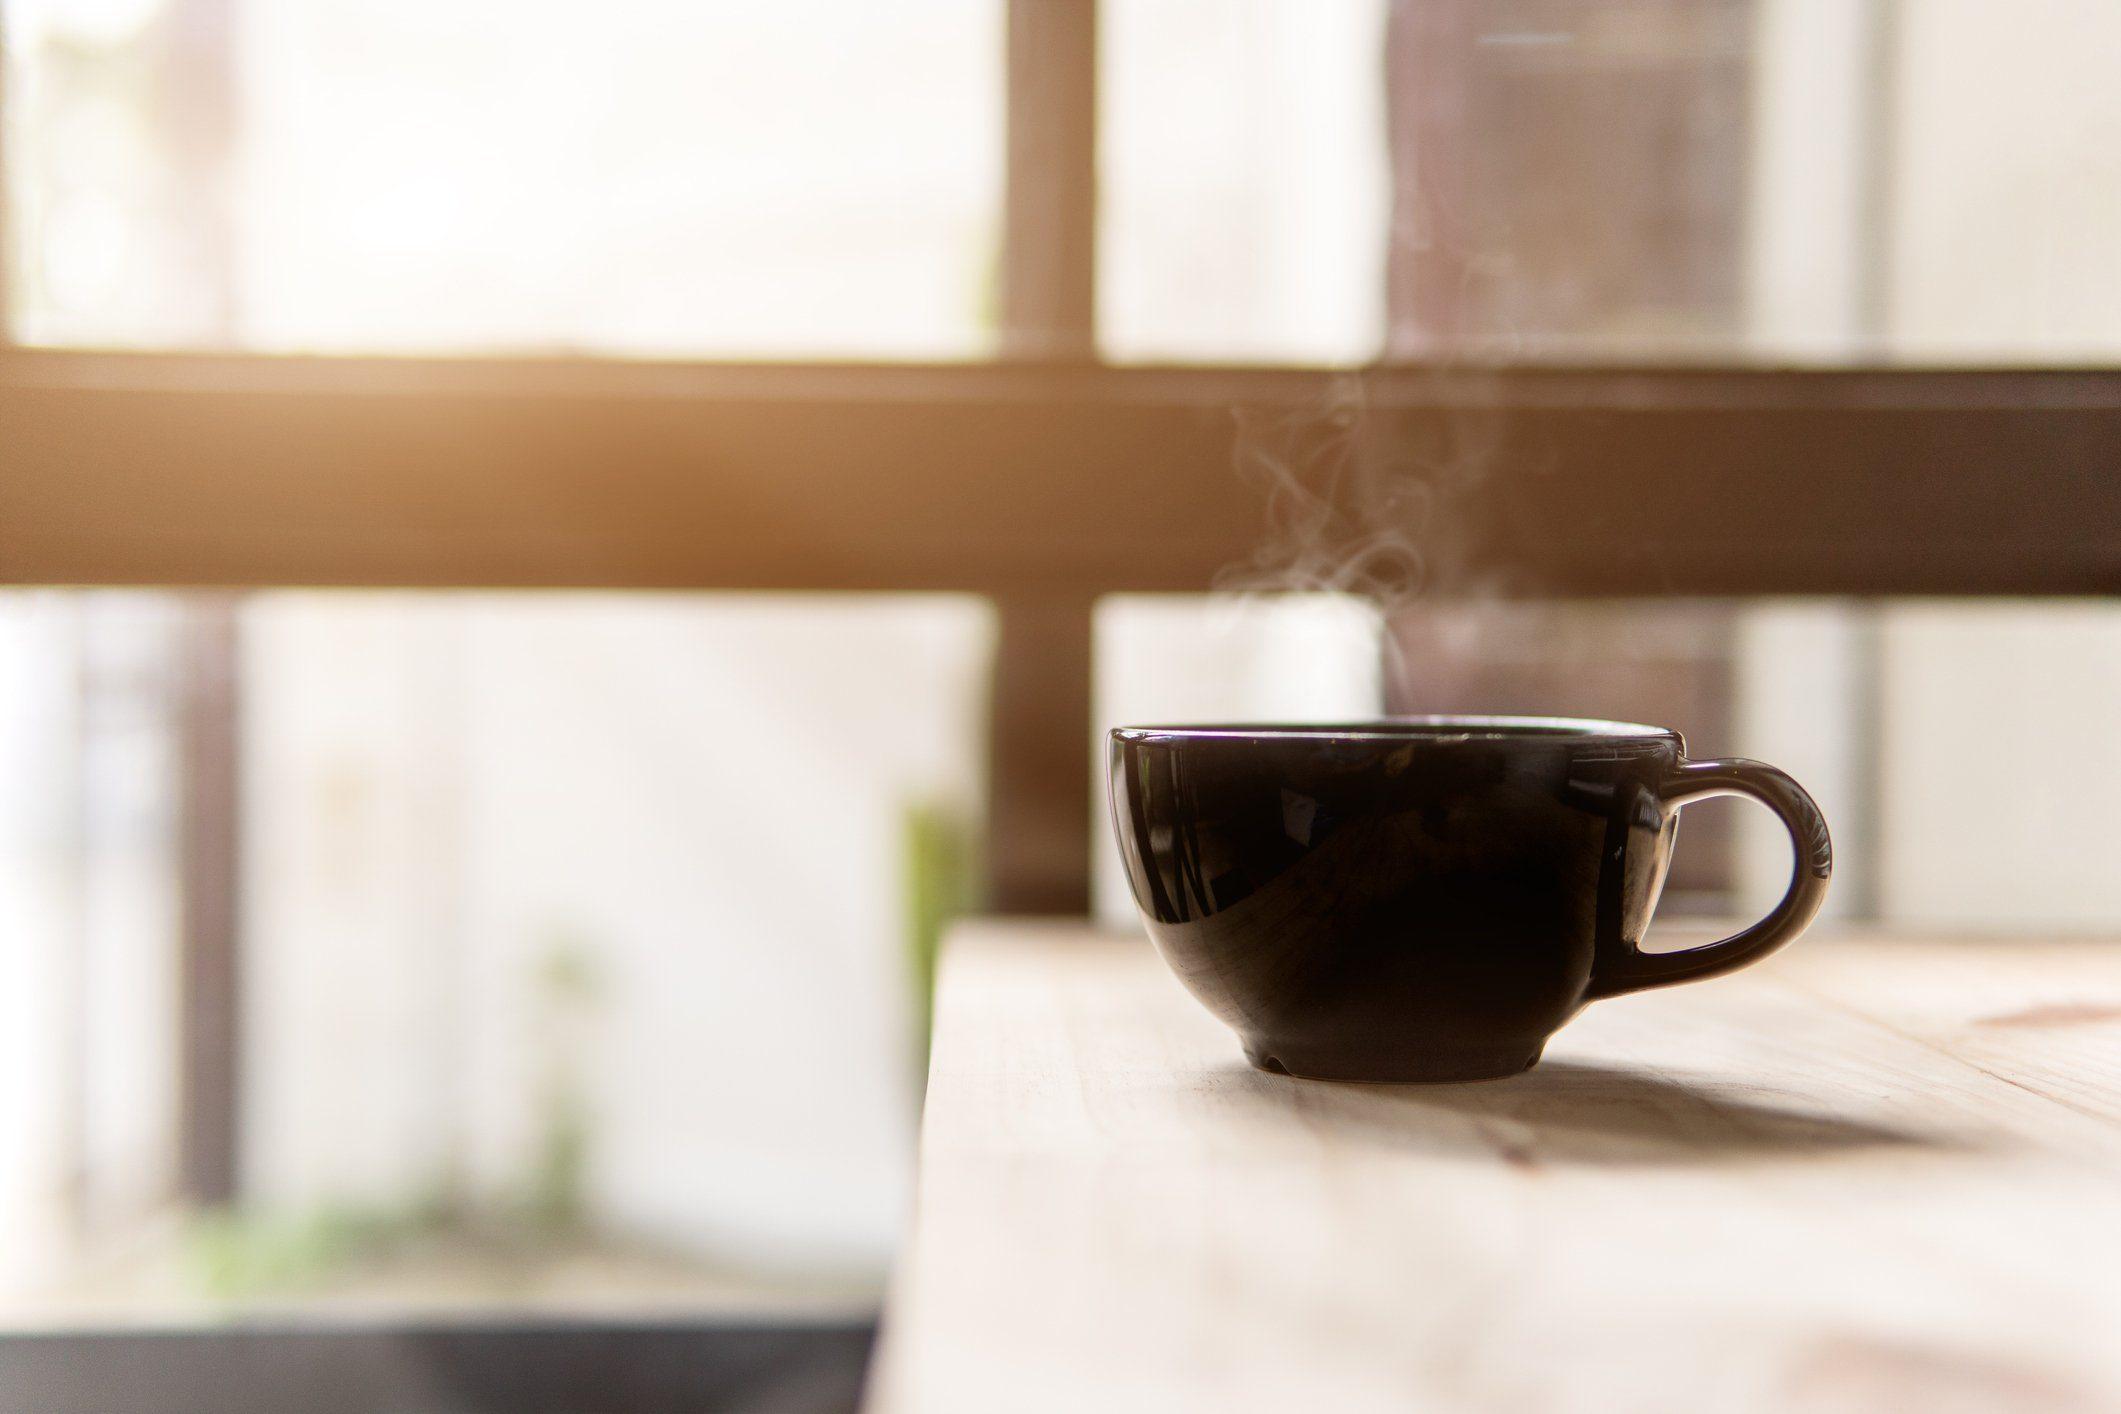 doctors eat for breakfast | hot tea in the morning